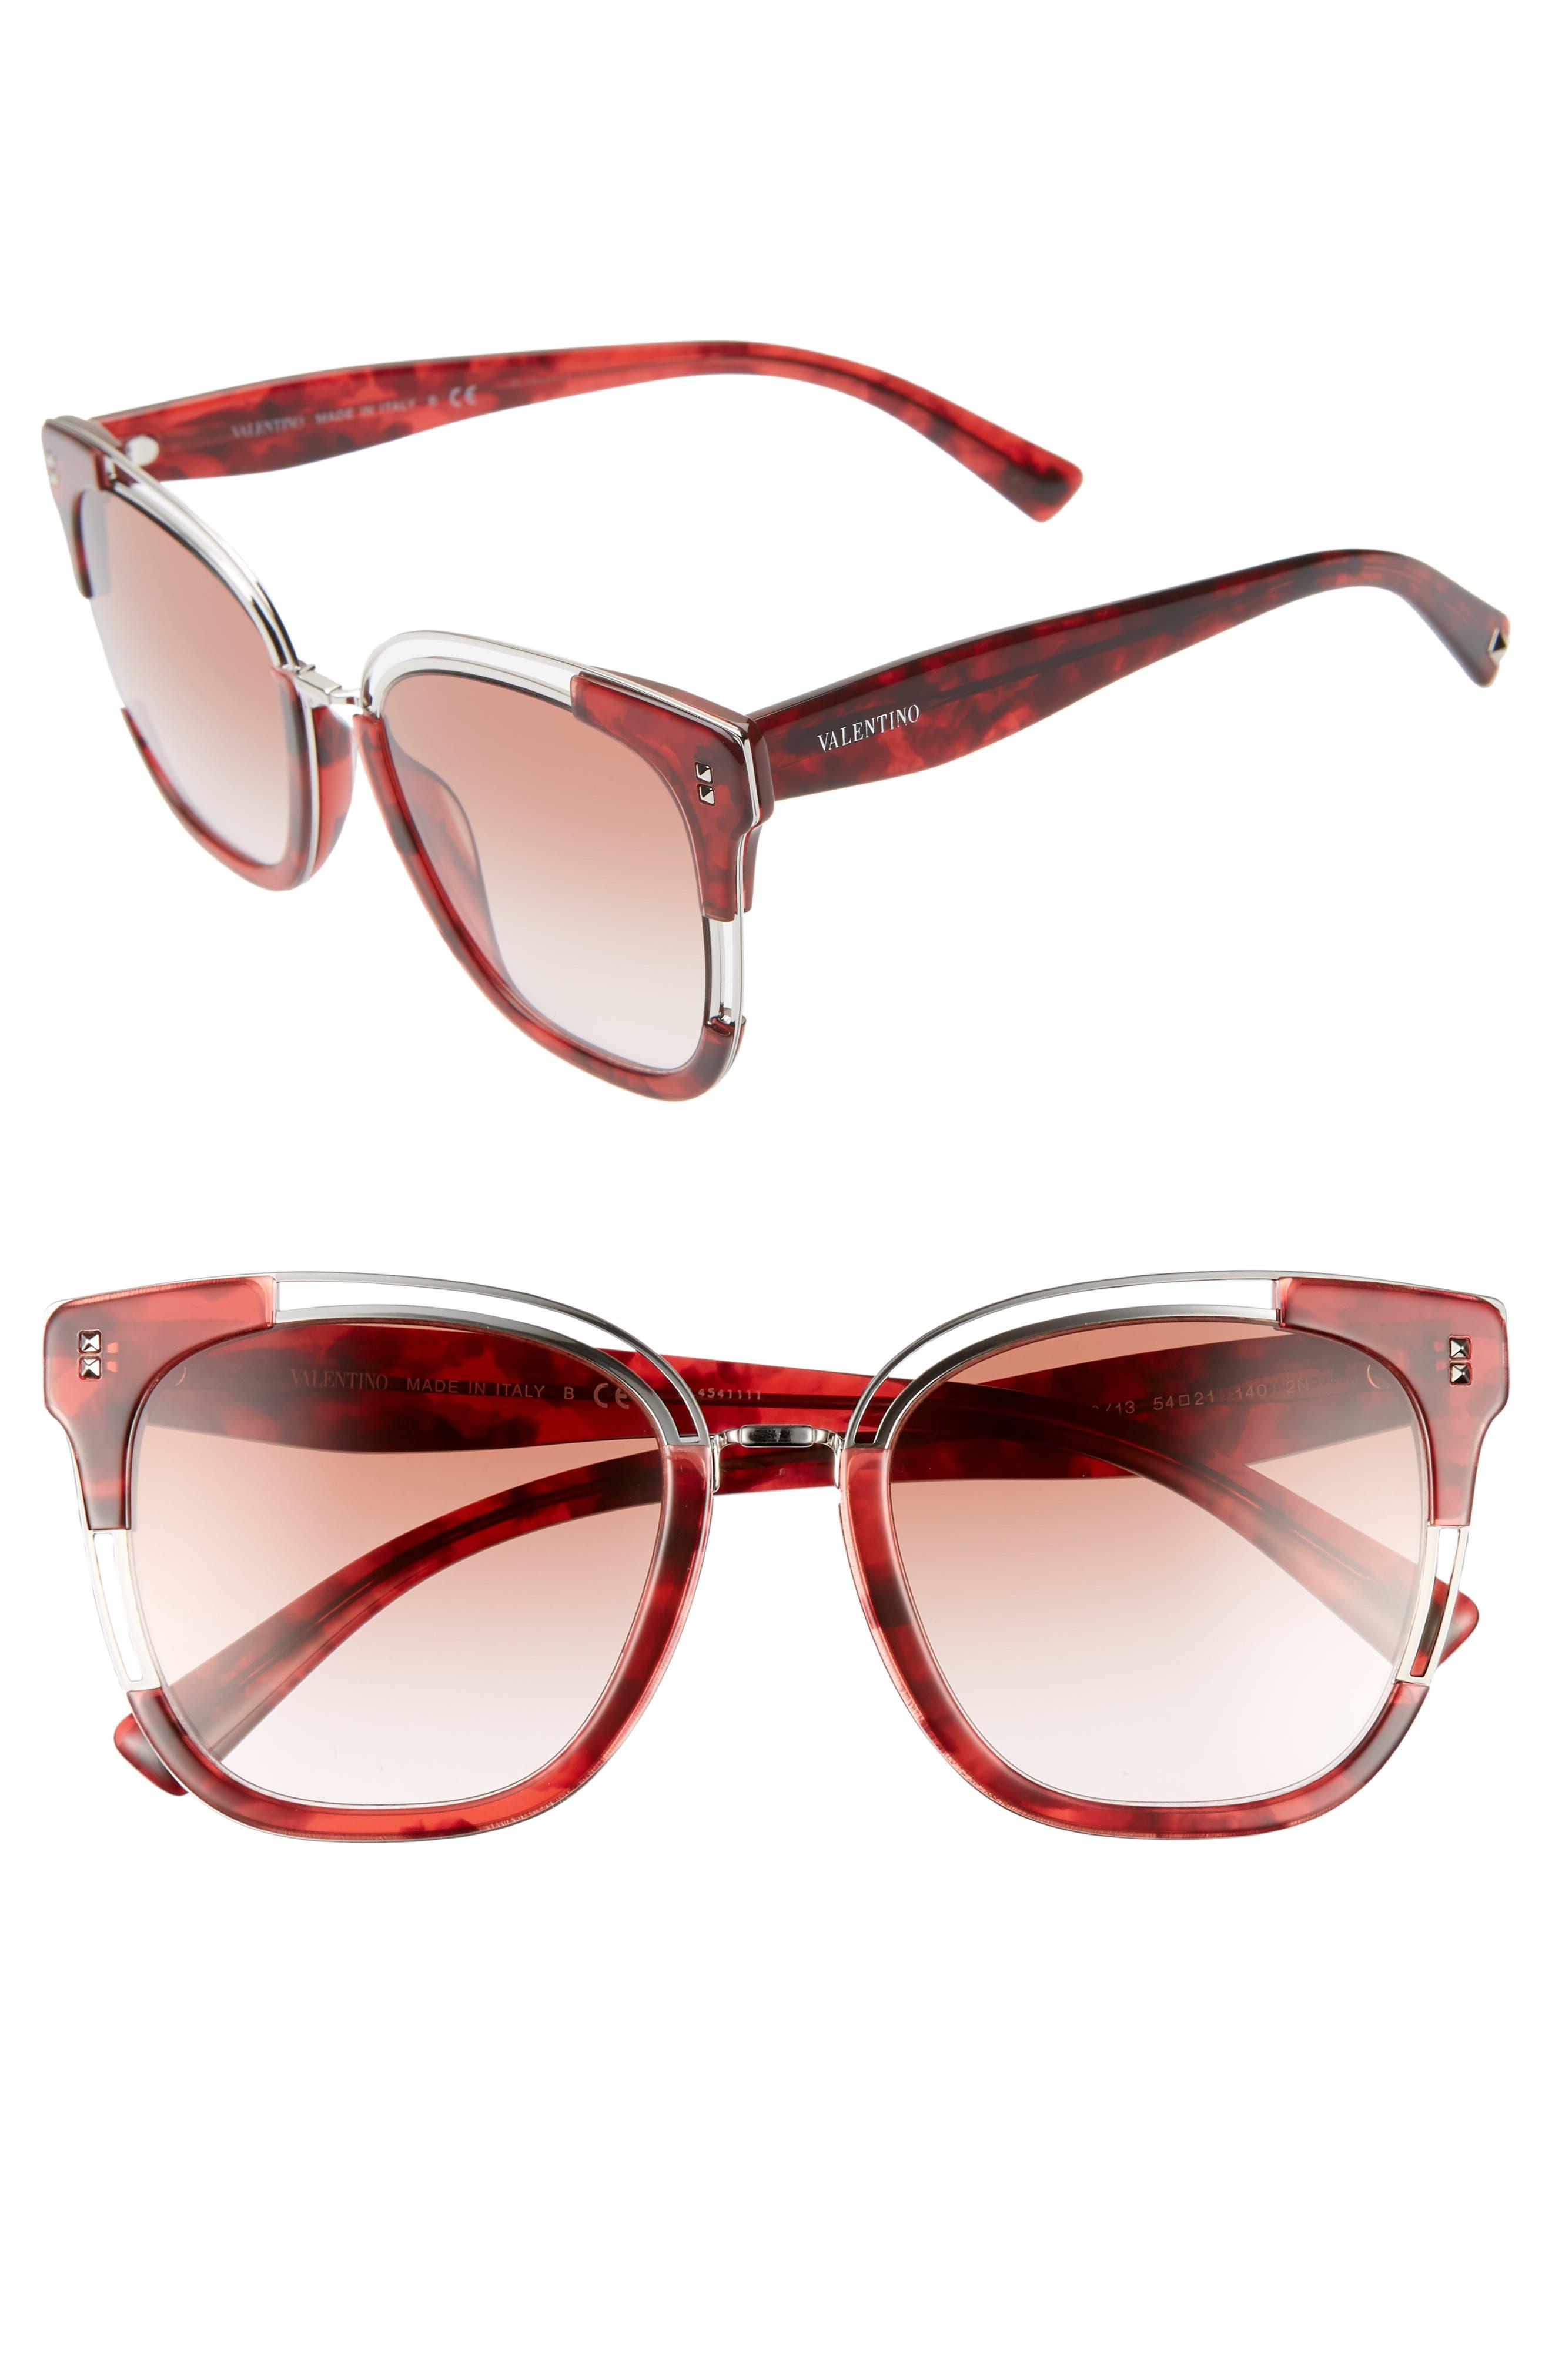 dc47a0221a Valentino Sunglasses for Women